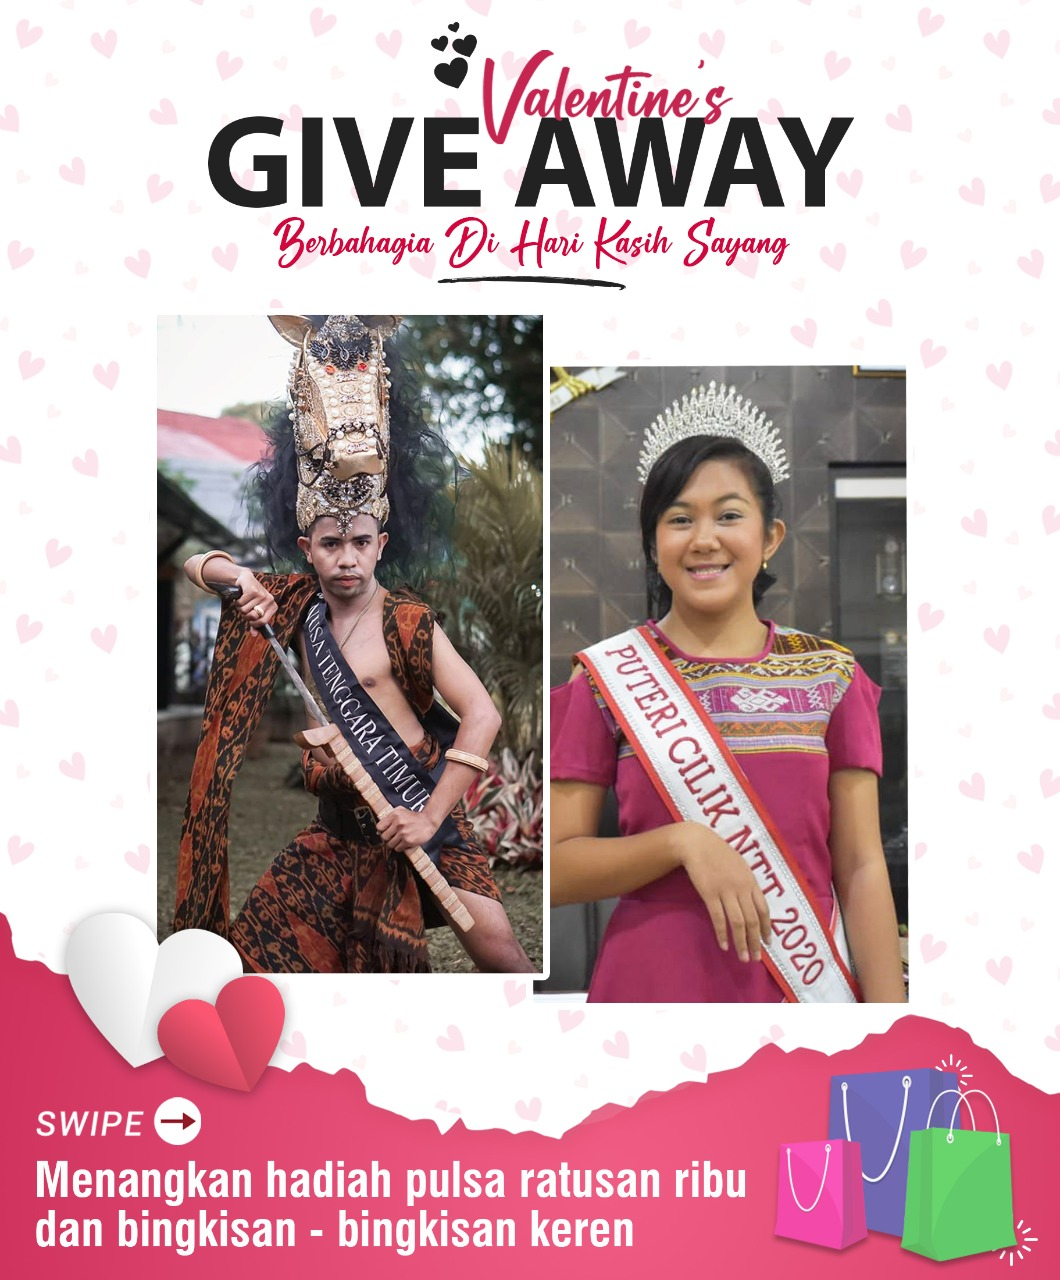 Yuk, Rayakan 'Valentine Day' Bersama Putri Cilik dan Putra Tari Indonesia Asal NTT